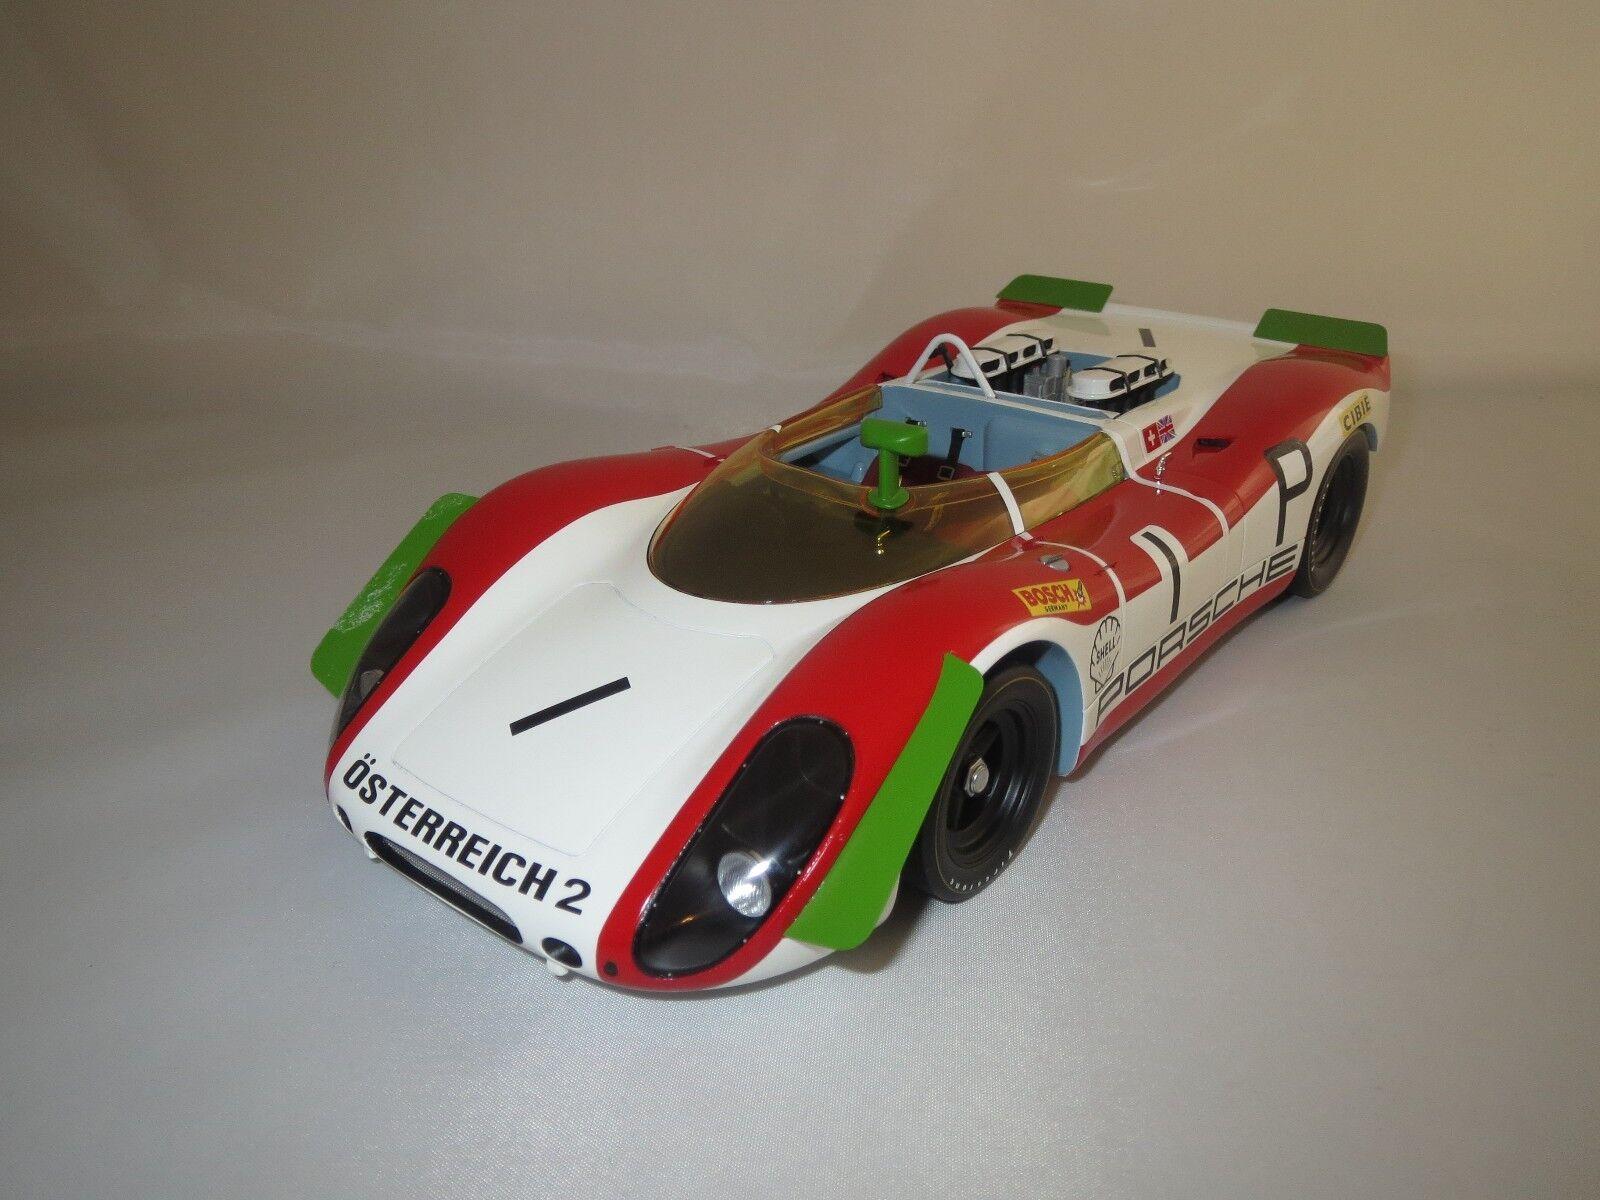 Minichamps Porsche 908 02 Spyder  1  Nürburgring' 69 69 69  1 18 sans emballage b801df